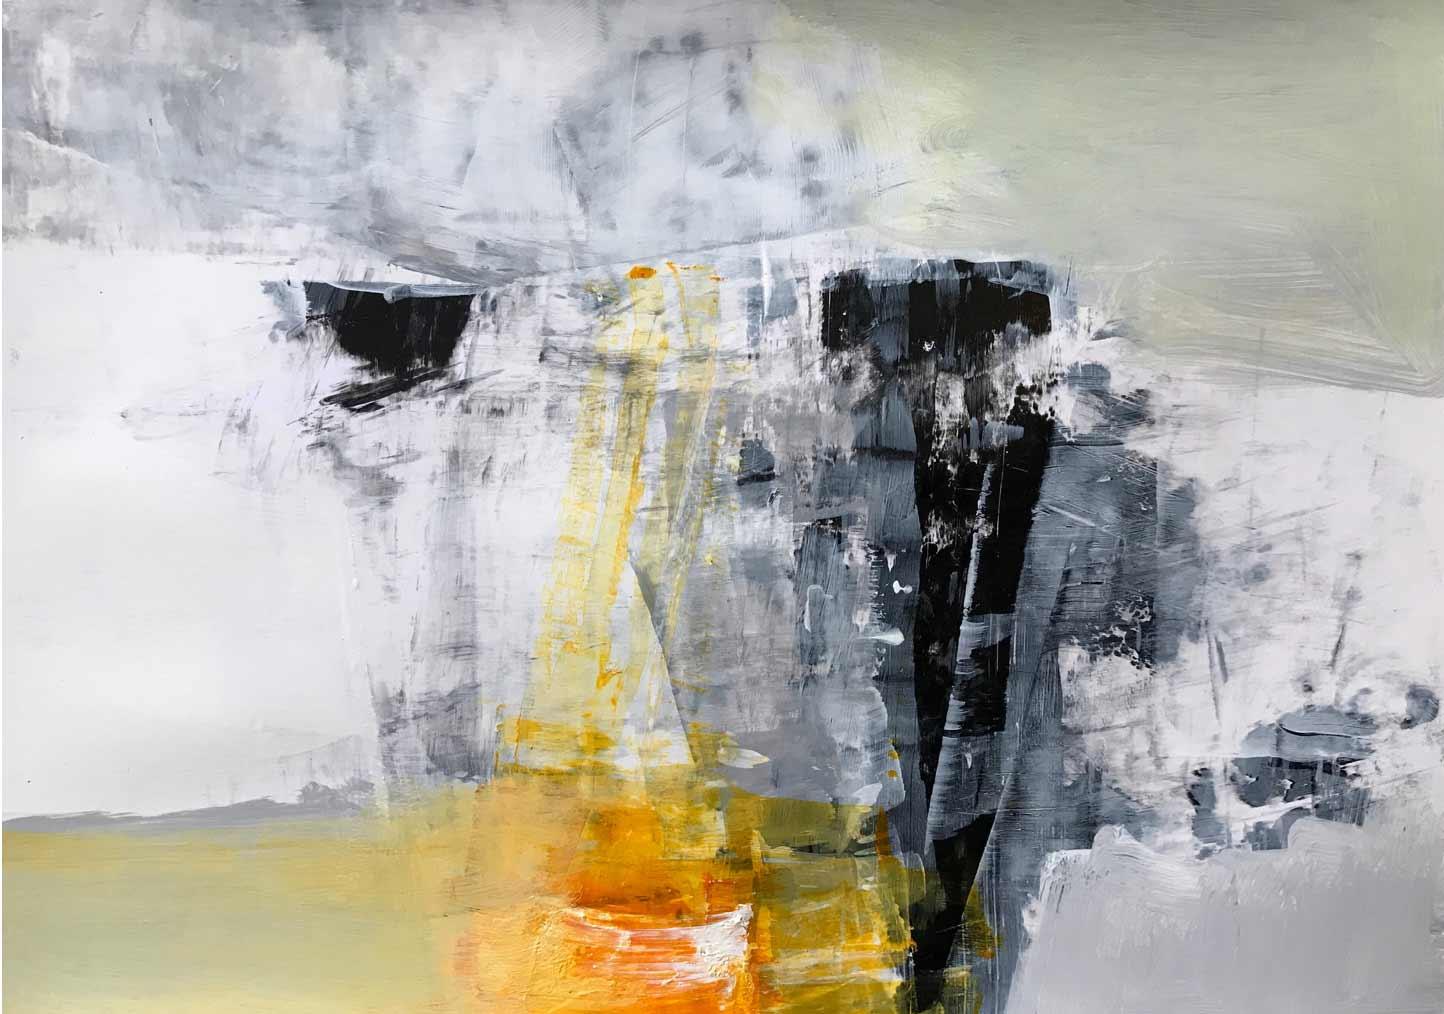 Atmospheres artwork by Neil Canning for Lemon Street Gallery